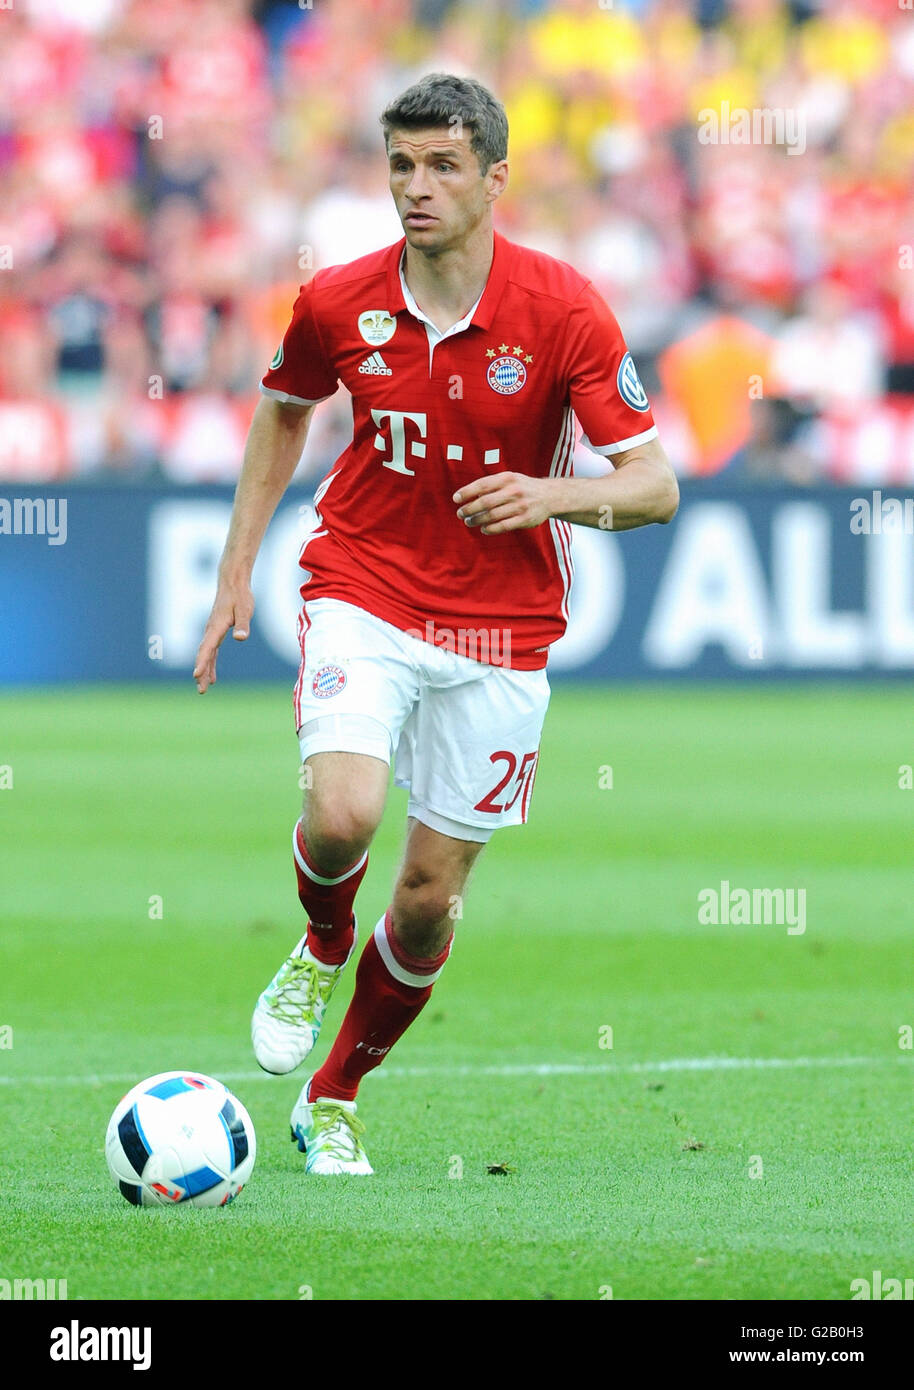 German Cup Final at Olympic Stadium Berlin, FC Bayern Munich vs Borussia Dortmund: Thomas Mueller of Munich. - Stock Image